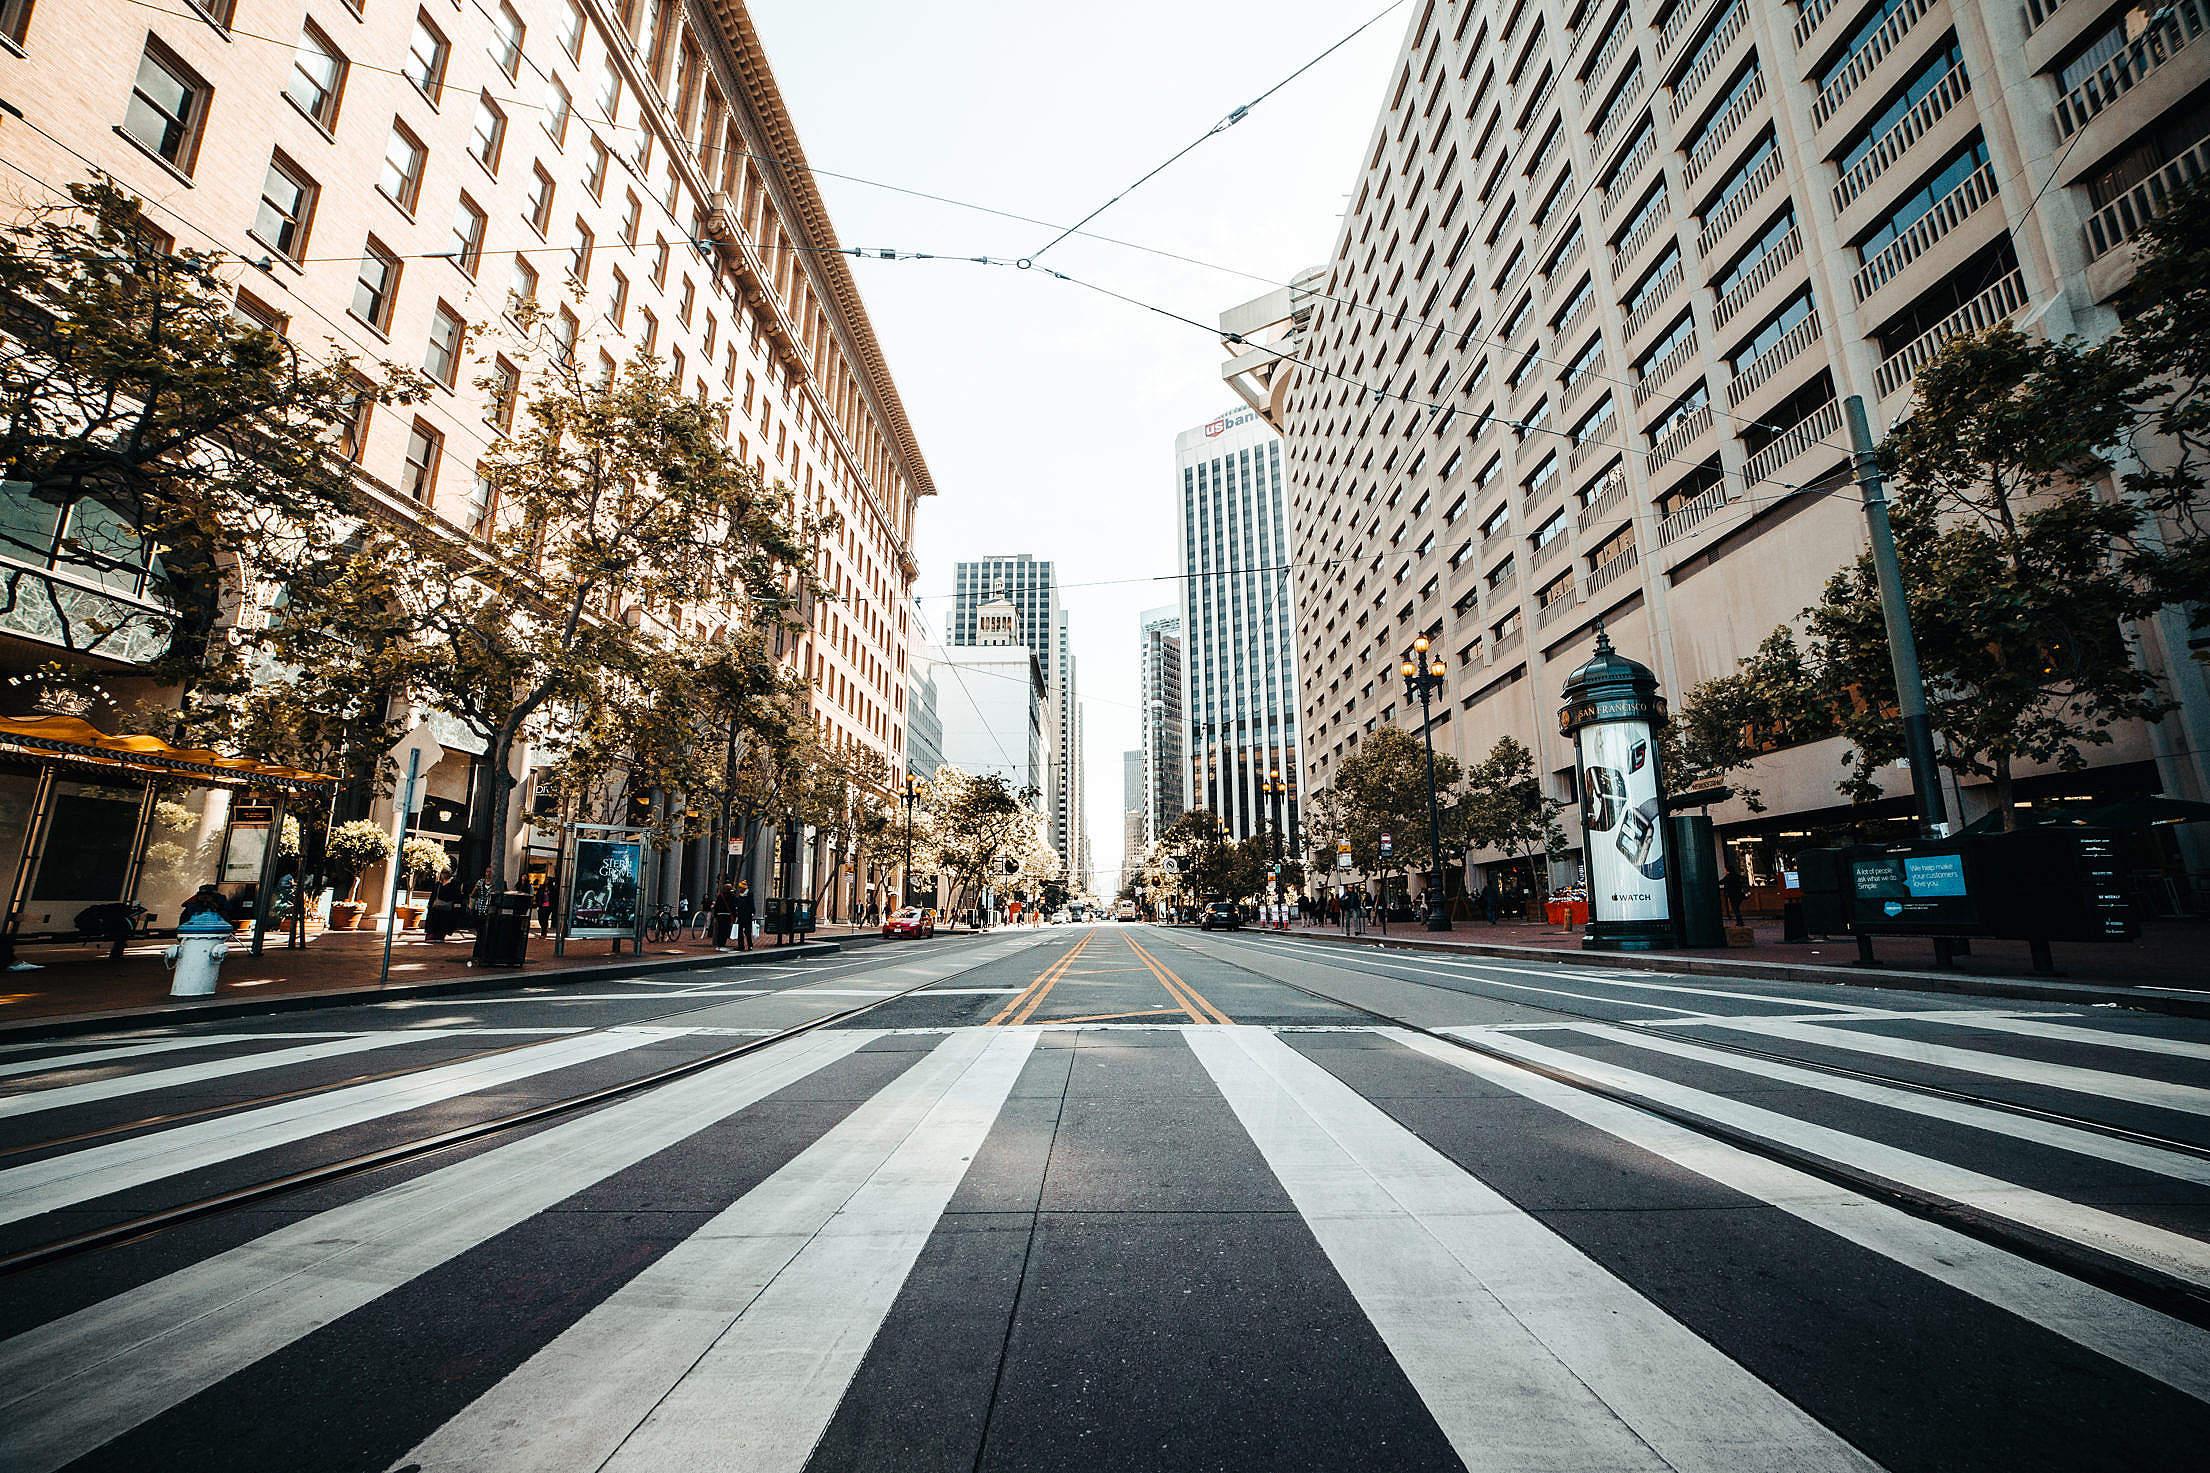 Market Street in San Francisco, California Free Stock Photo